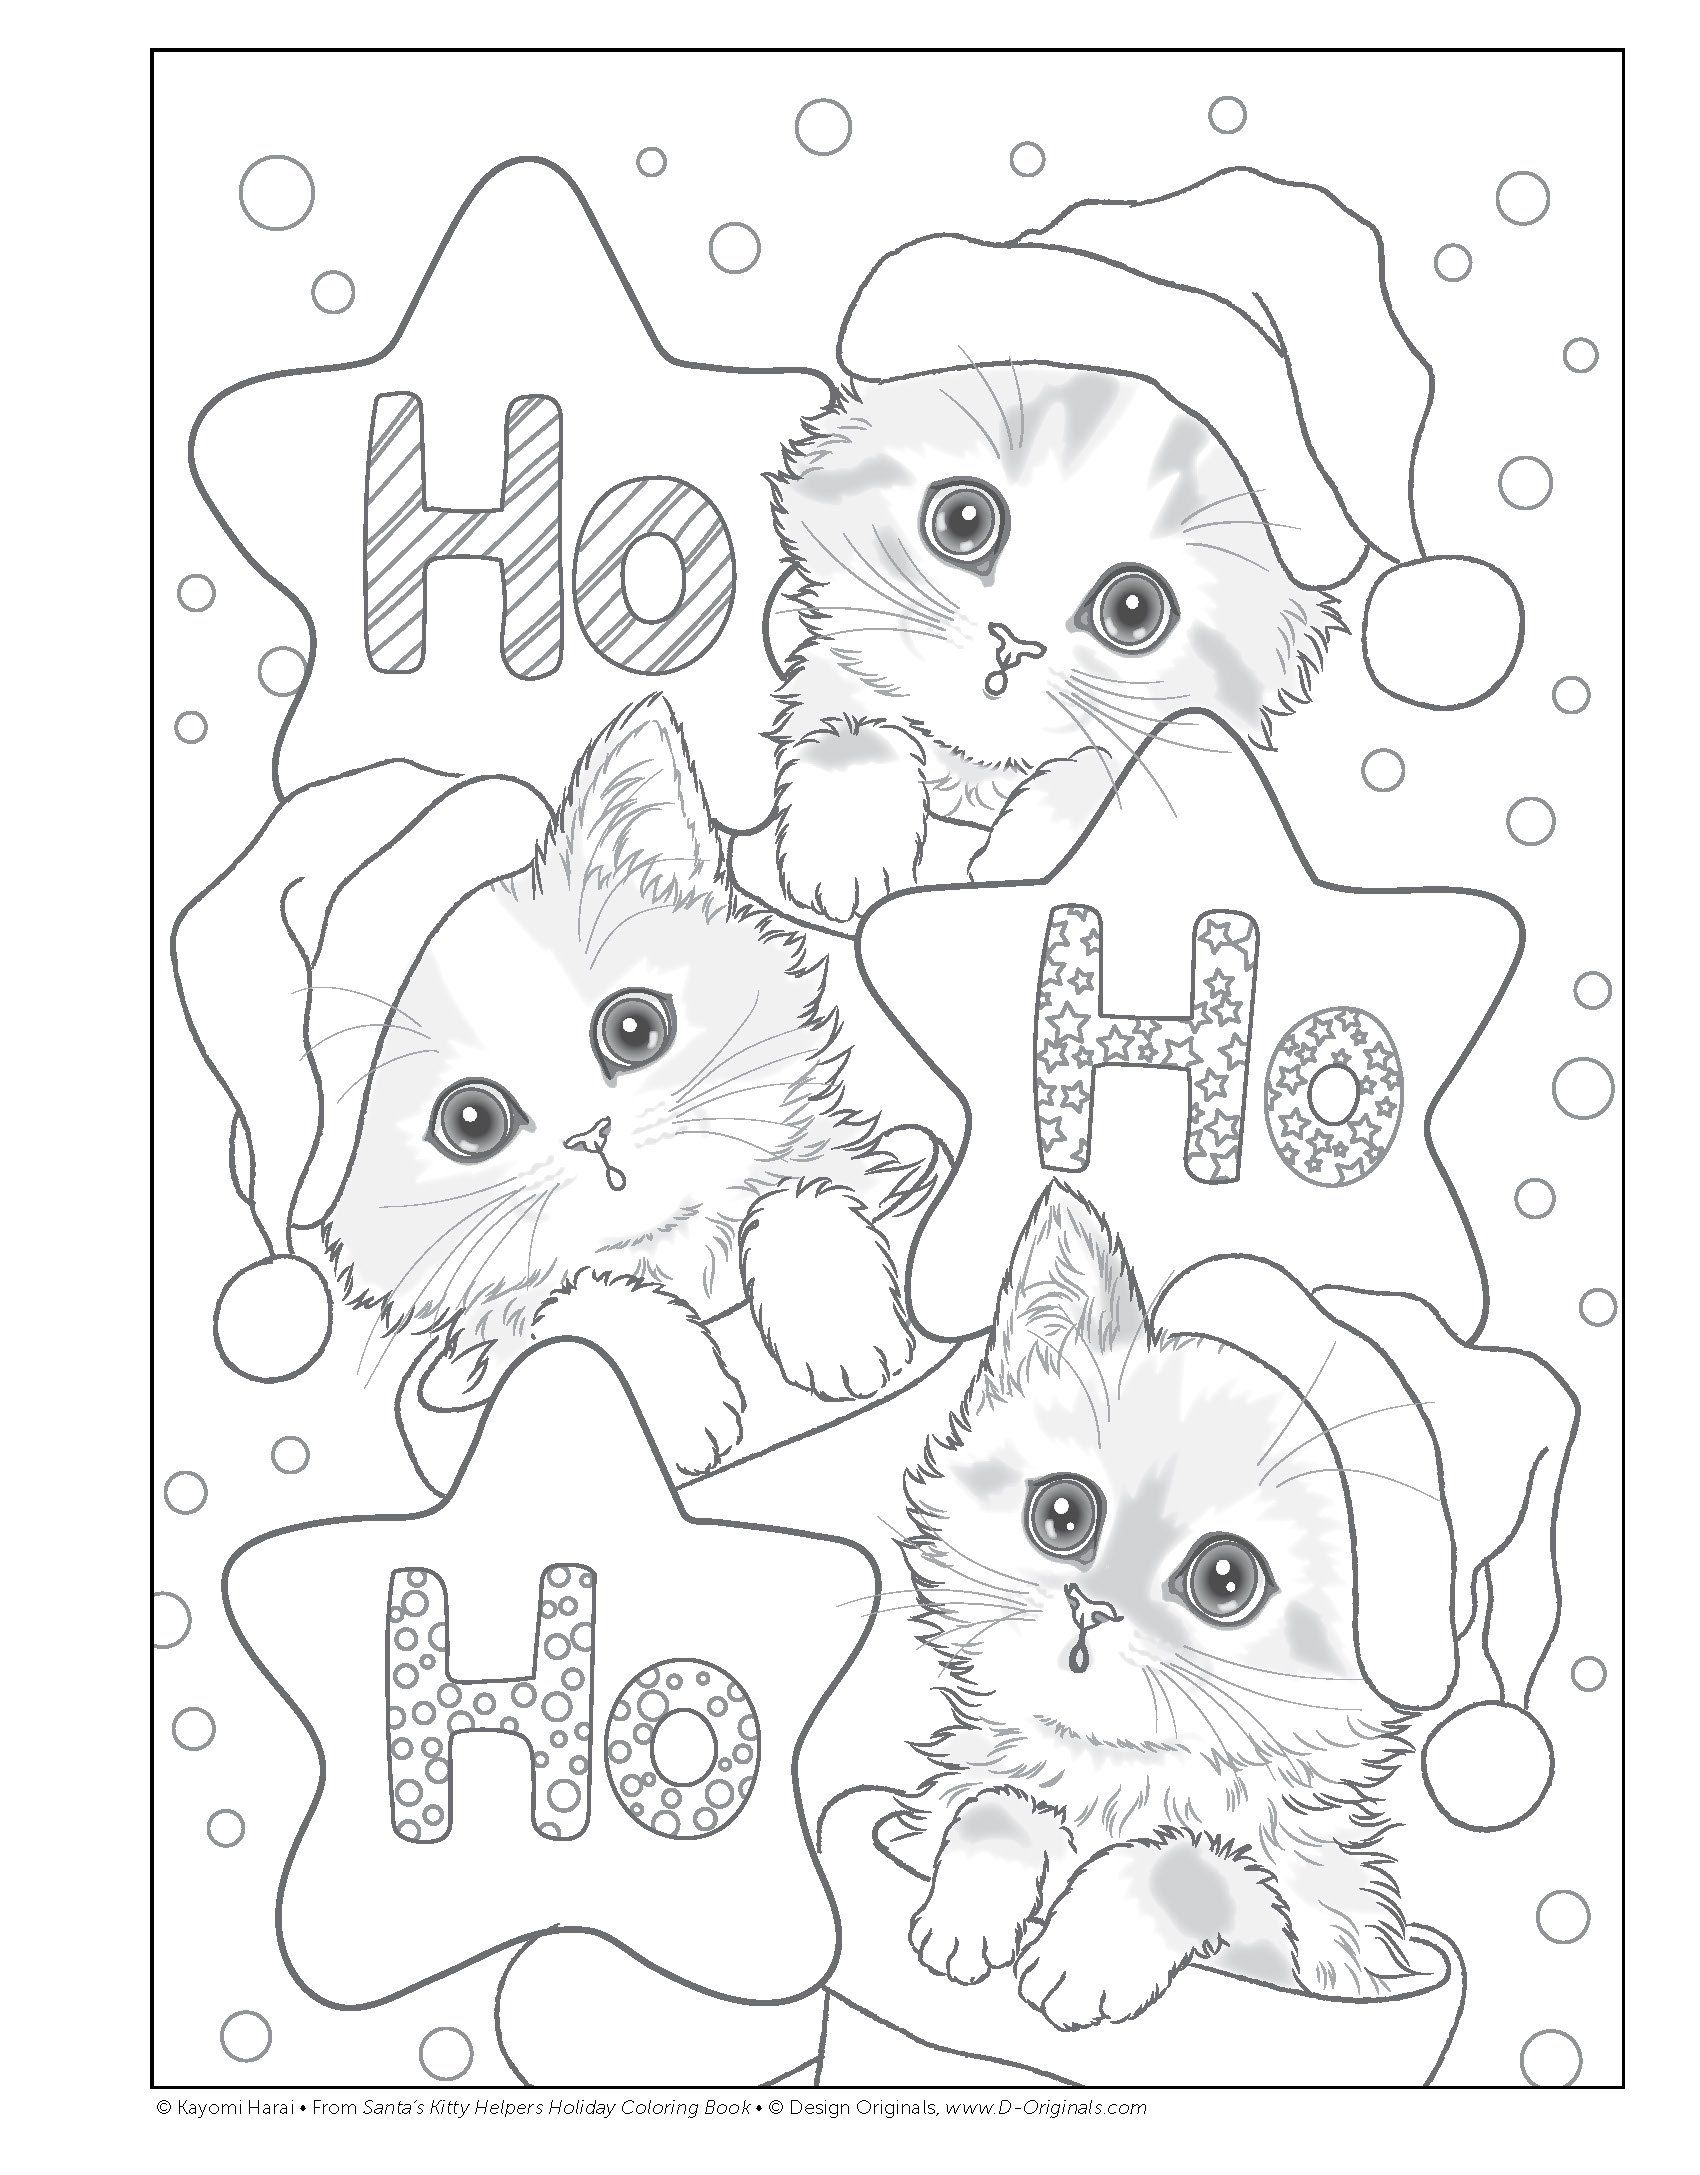 Santa\'s Kitty Helpers Holiday Coloring Book (Design Originals ...